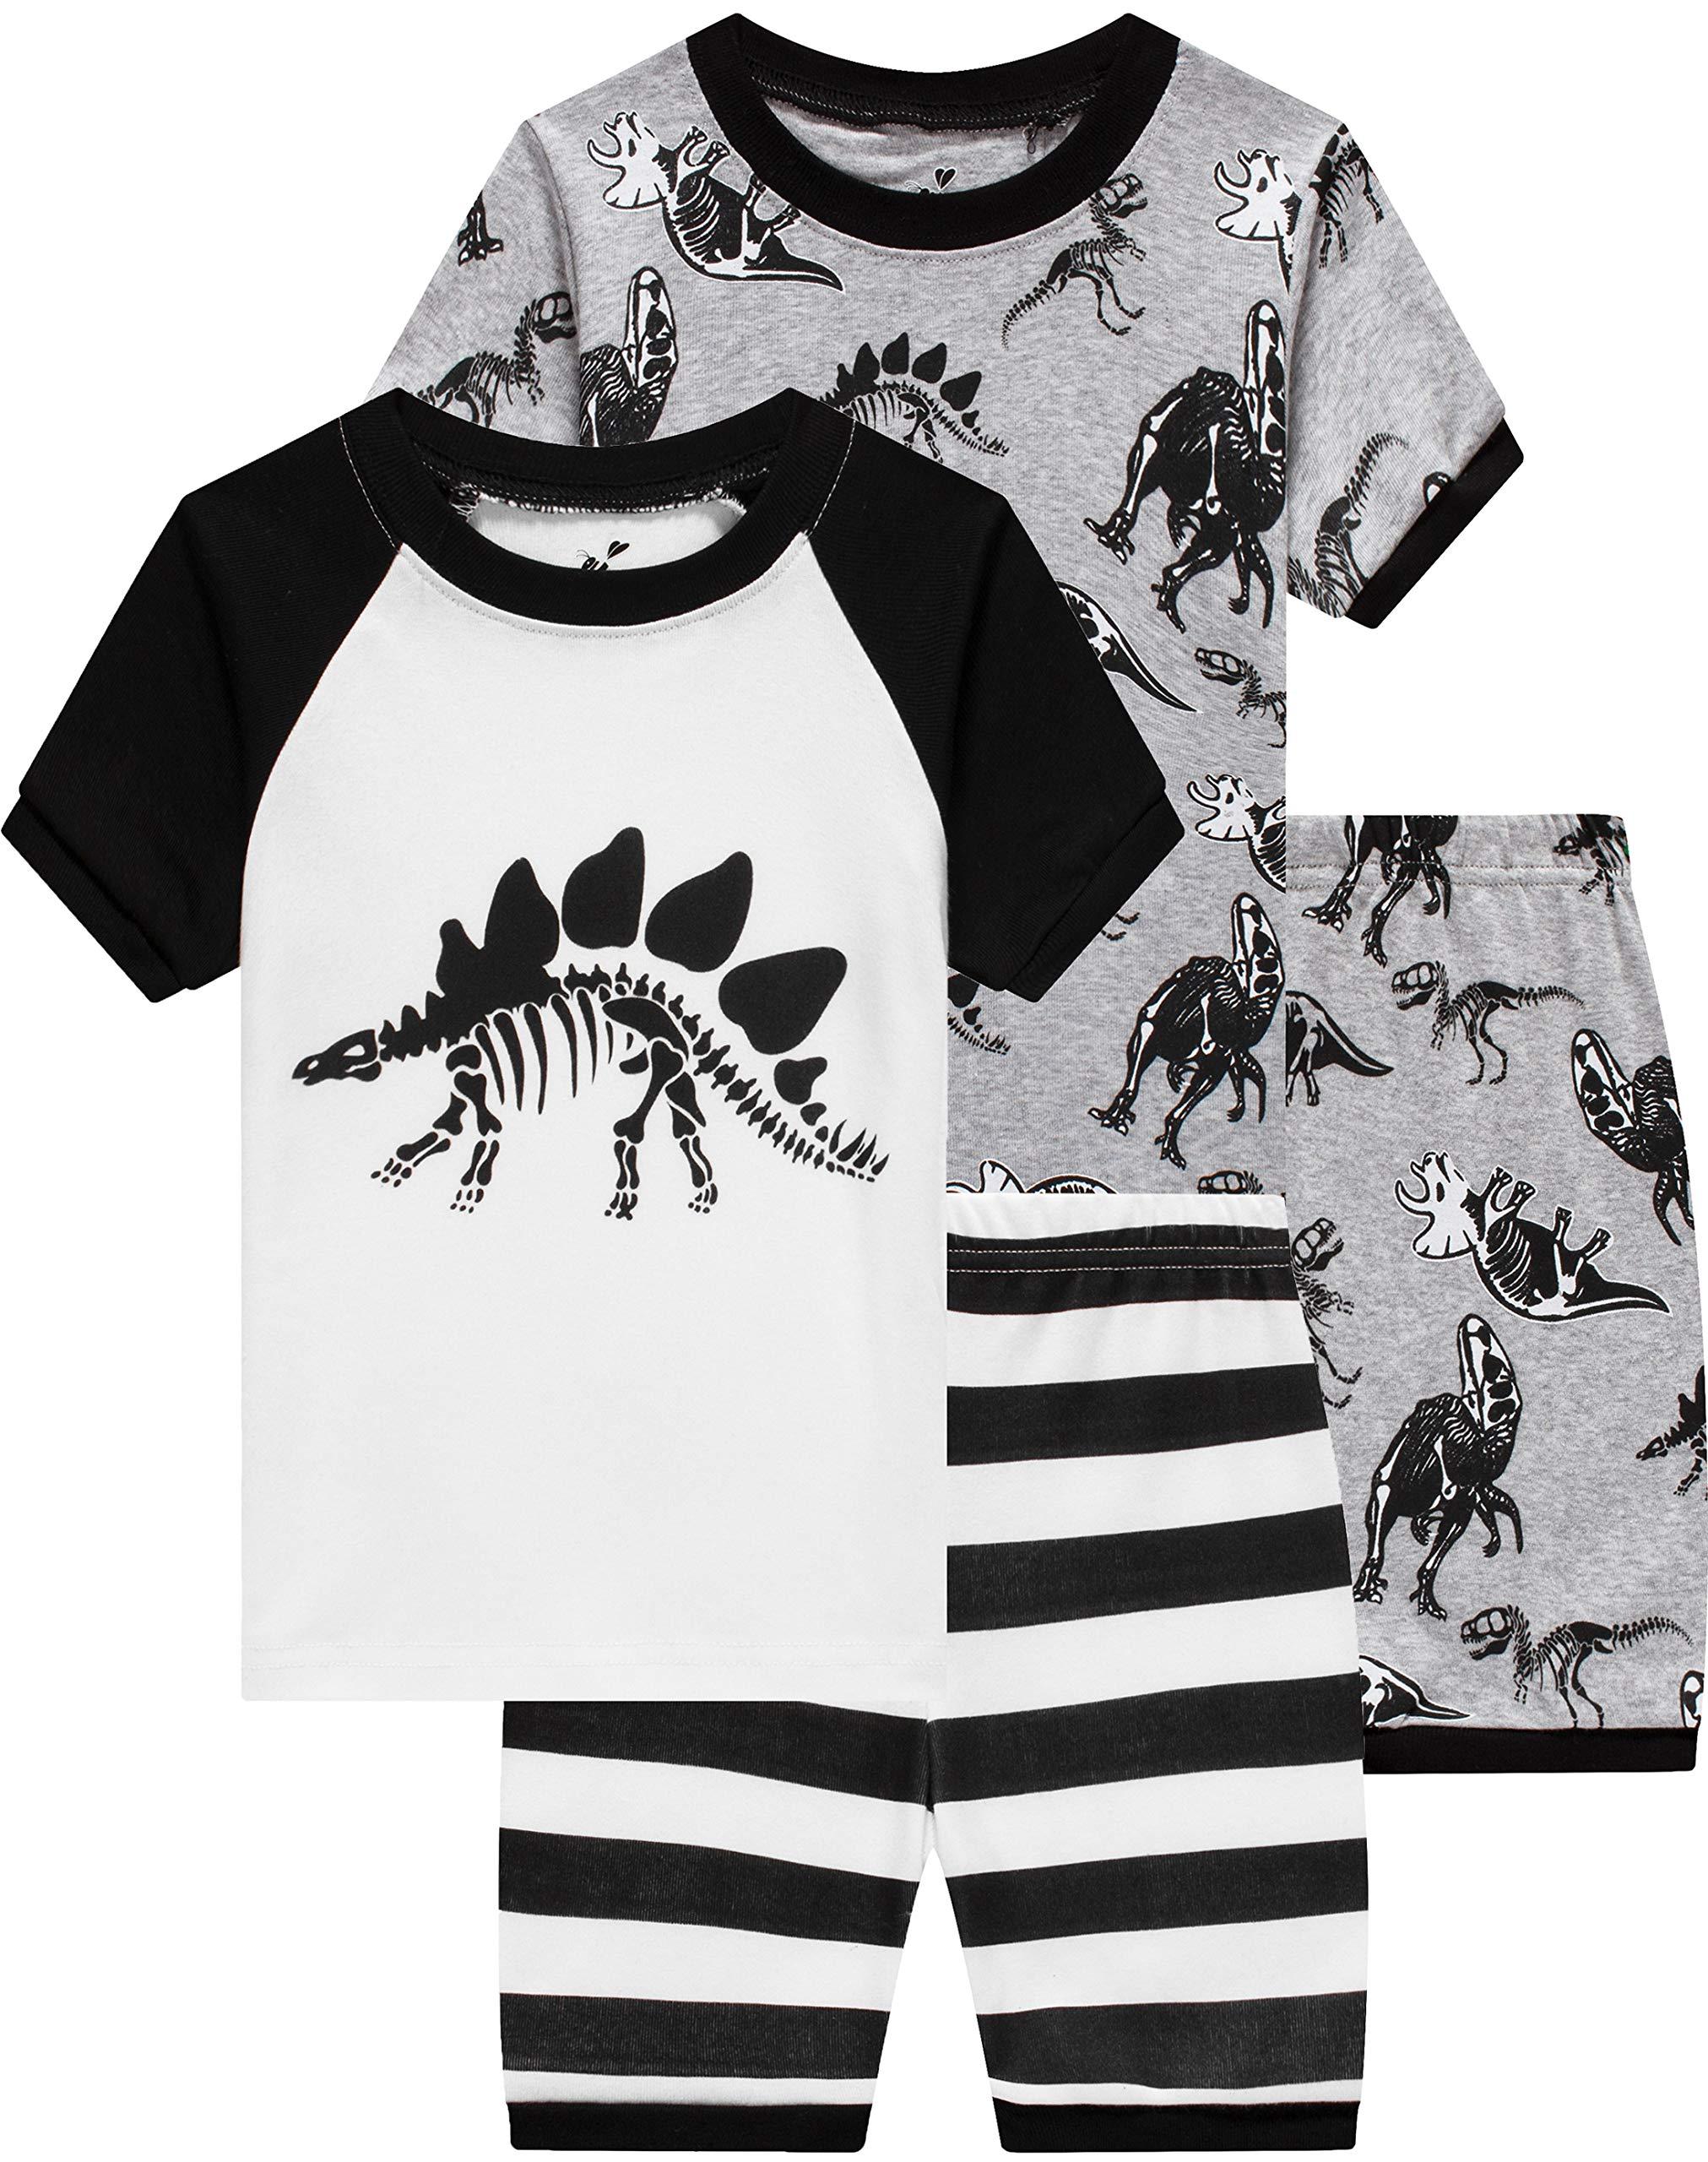 Boys Dinosaur Pajamas Children 4 Pieces Sleepwear Baby Clothes Summer Kids Short PJs Set 8t